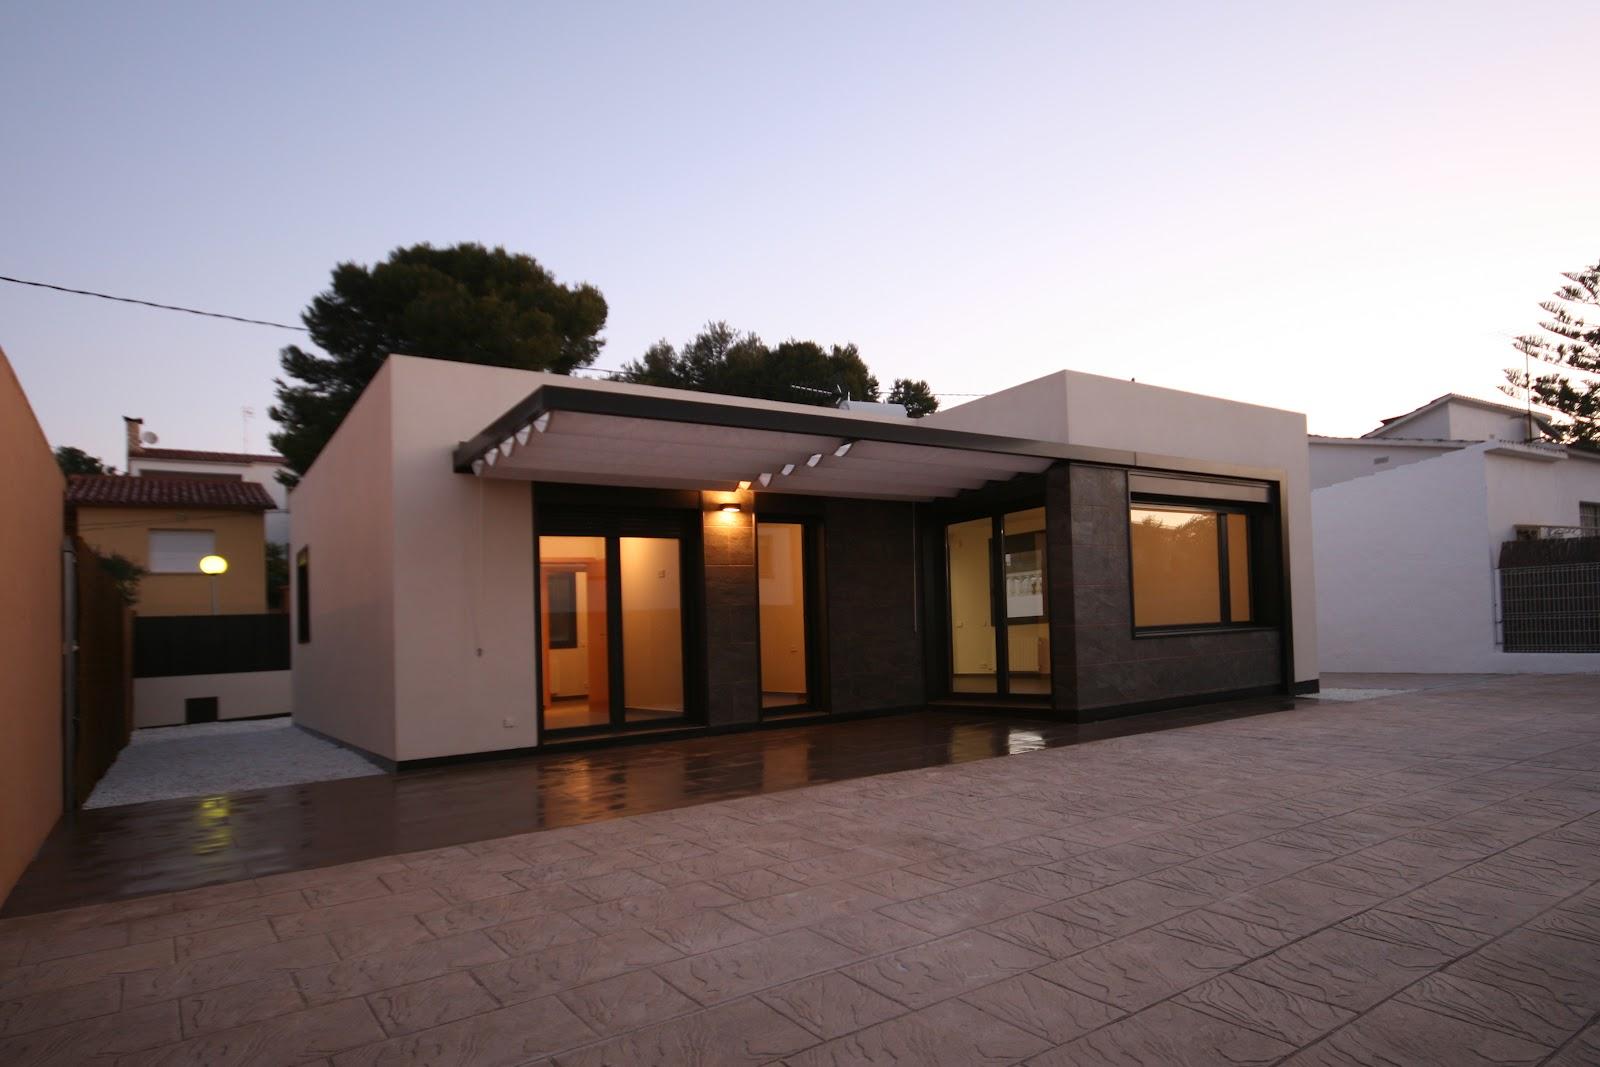 Casas modulares planos arquitectonicos - Casas clasicas modernas ...